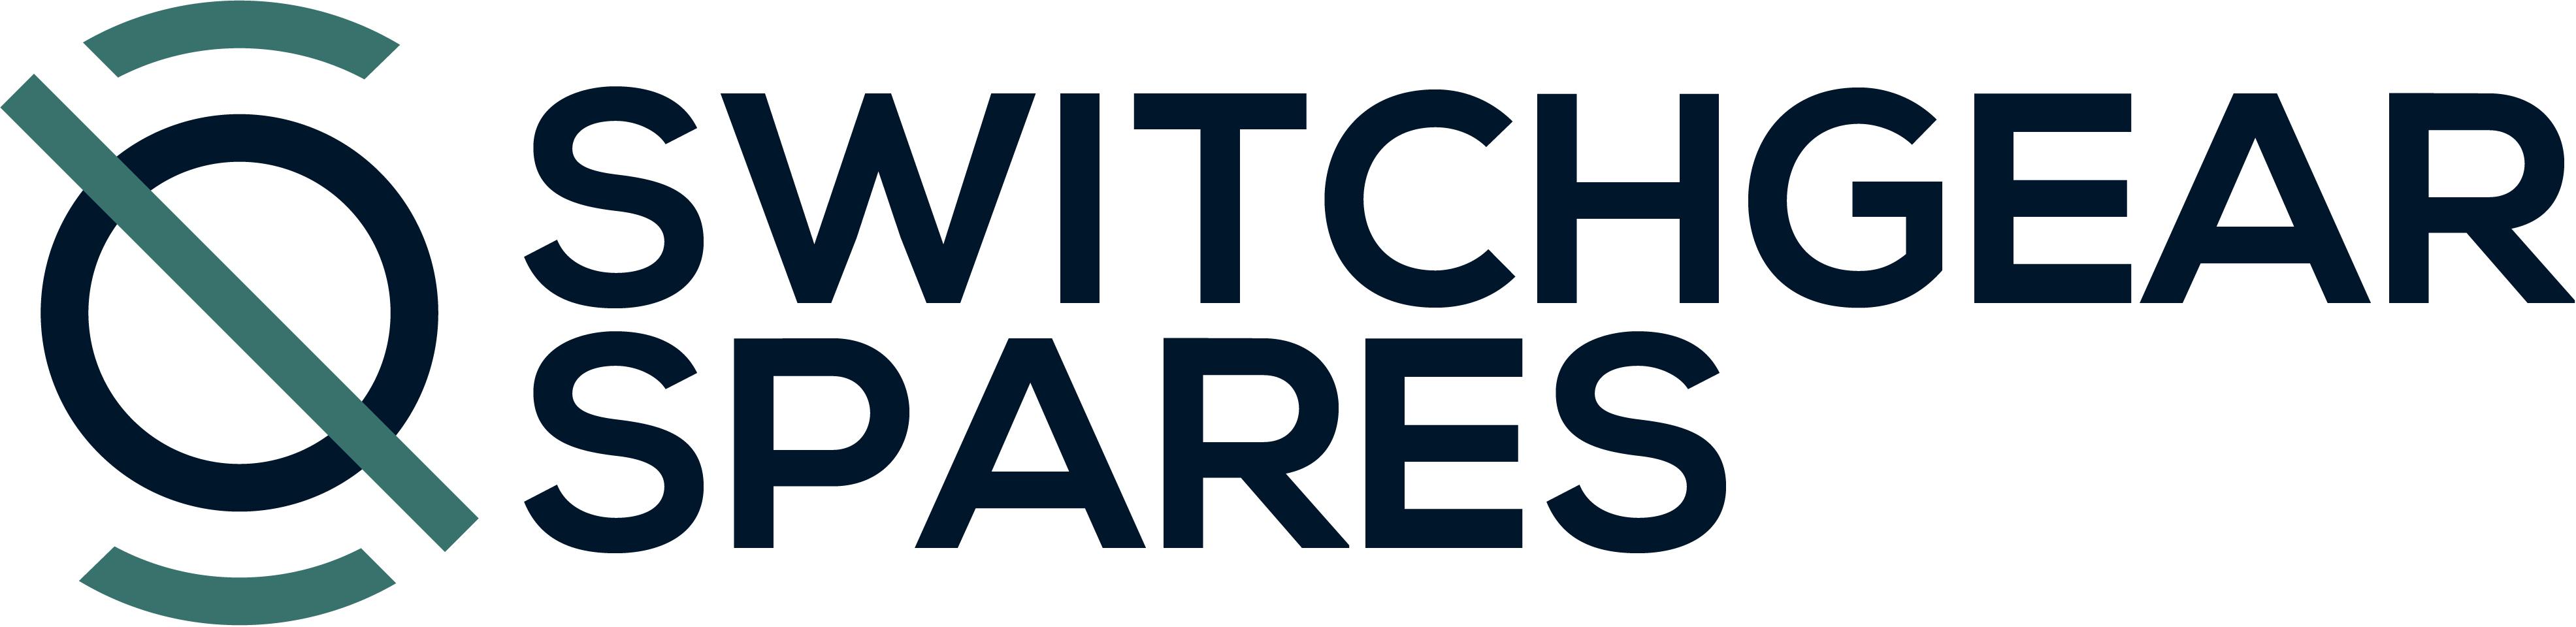 Switchgear Spares